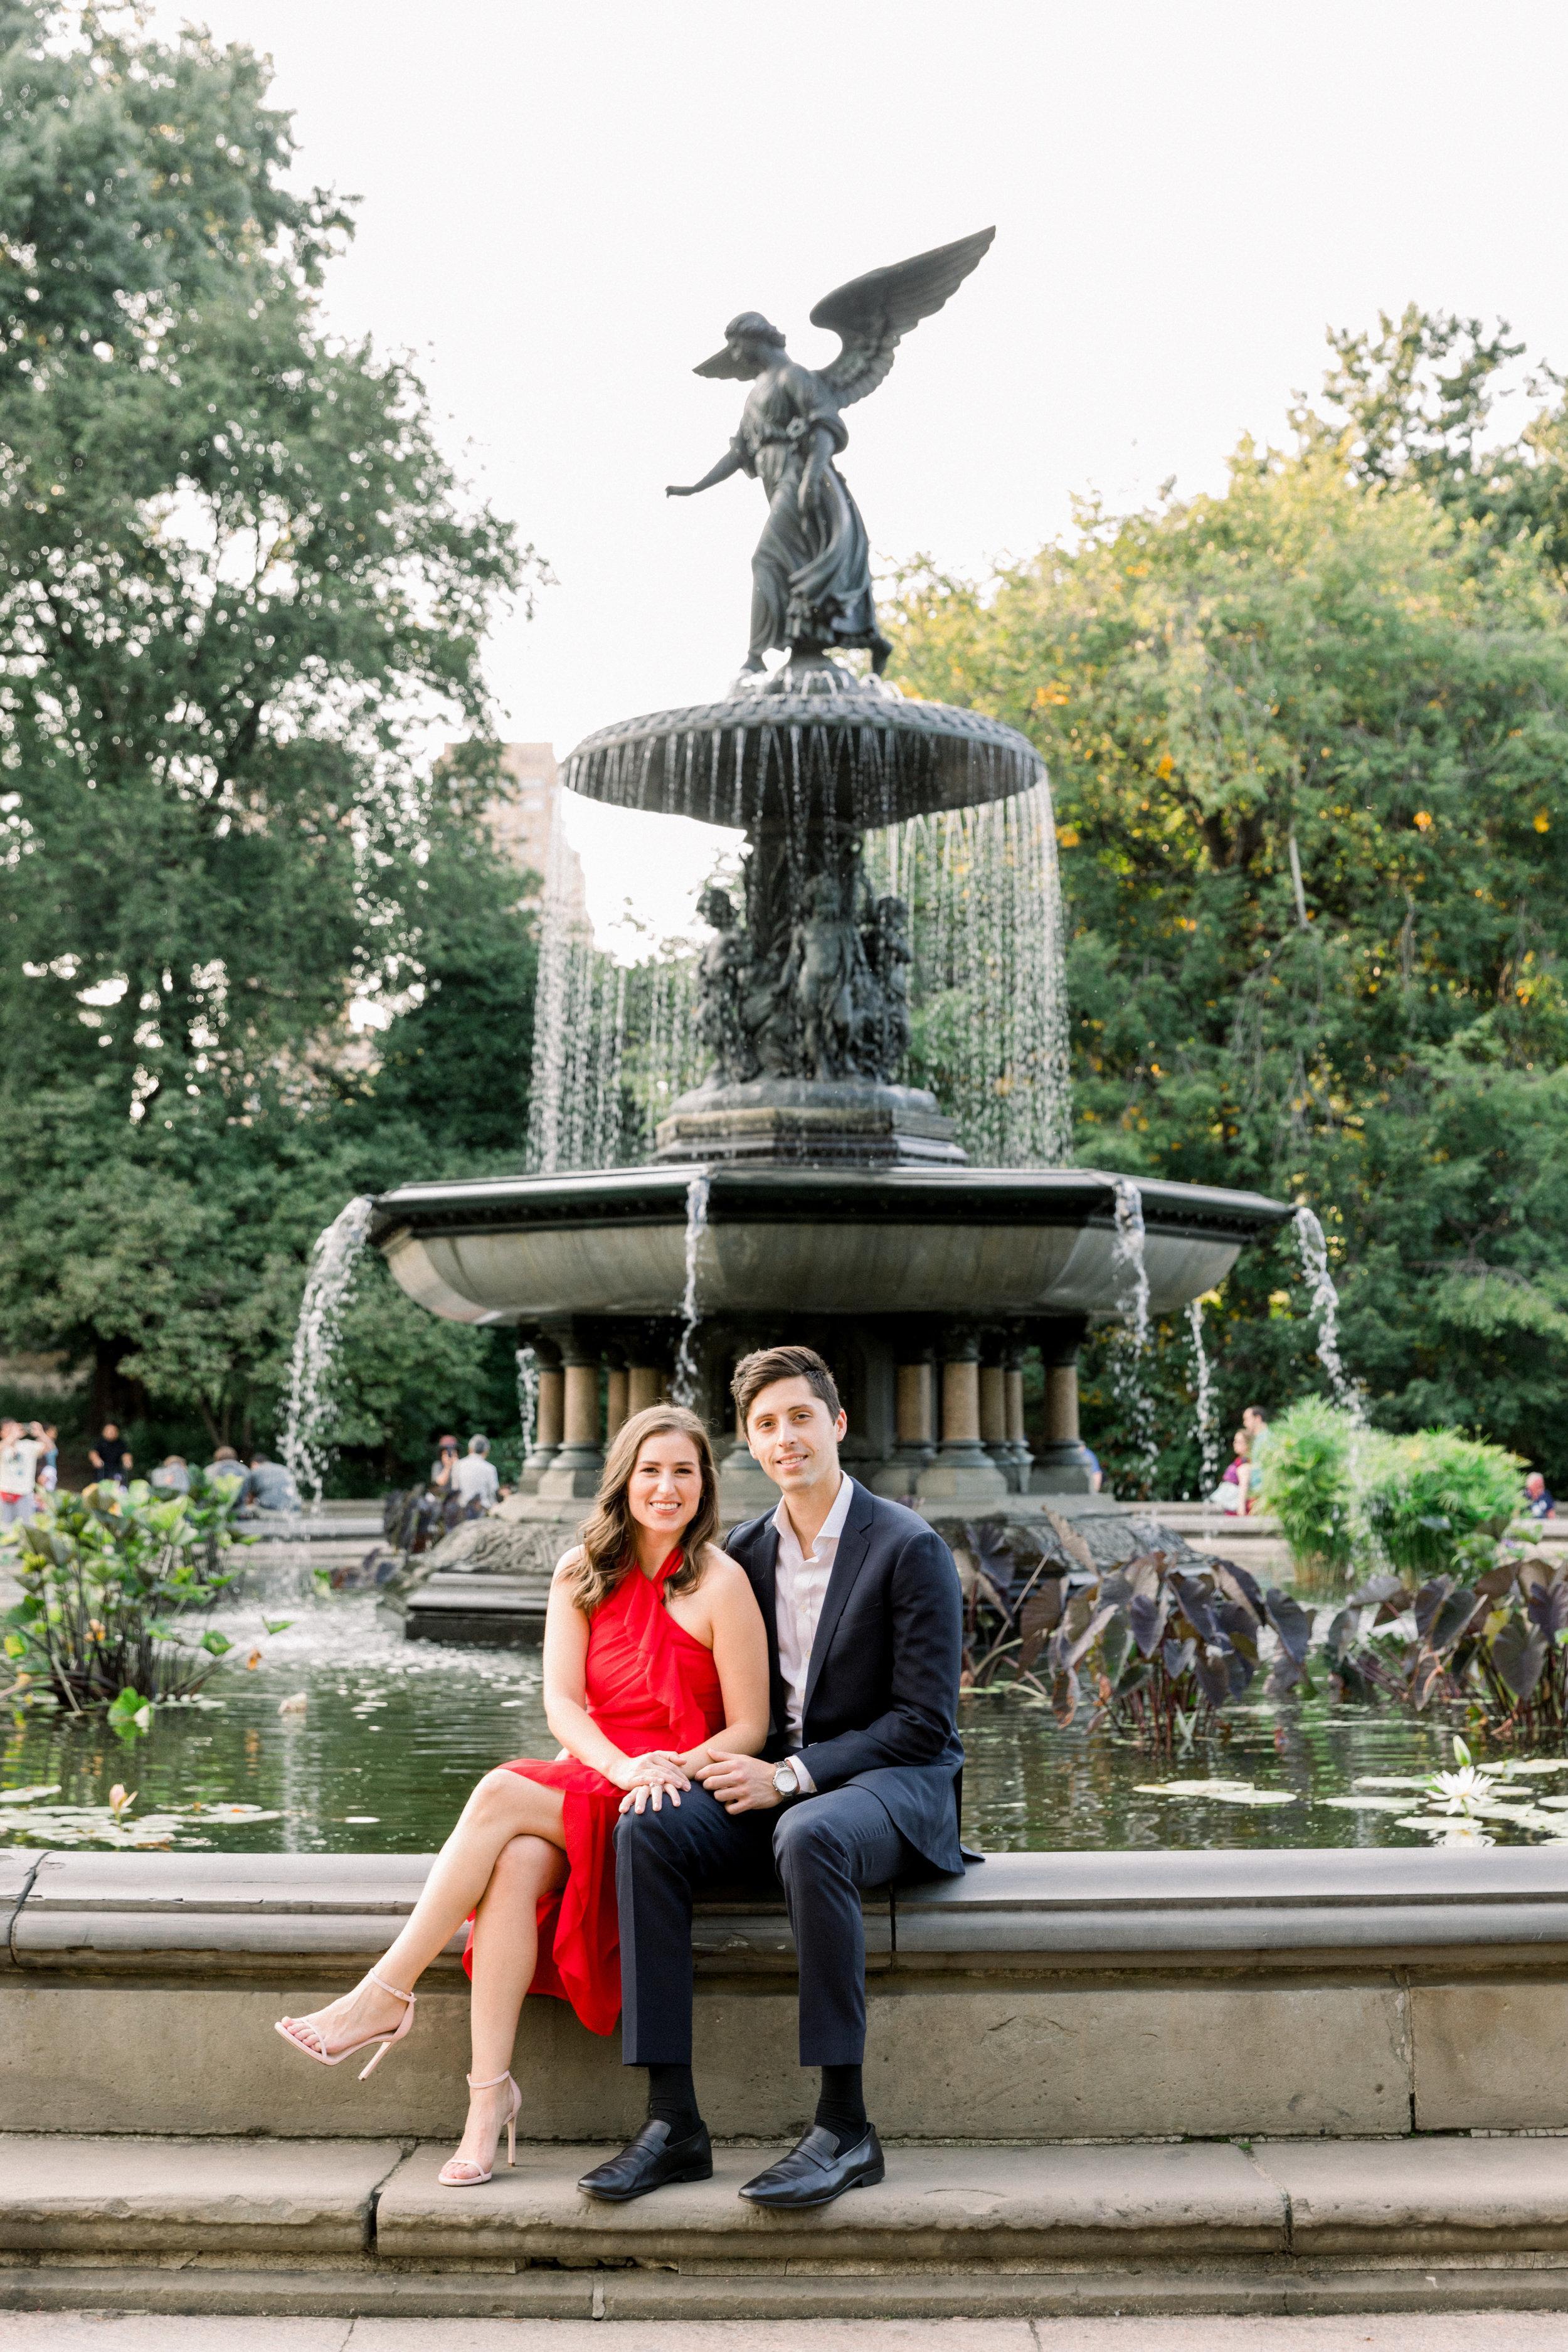 Hudson-Nichols-Central-Park-NYC-Fine-Art-Film-Engagement-Photography-02.jpg